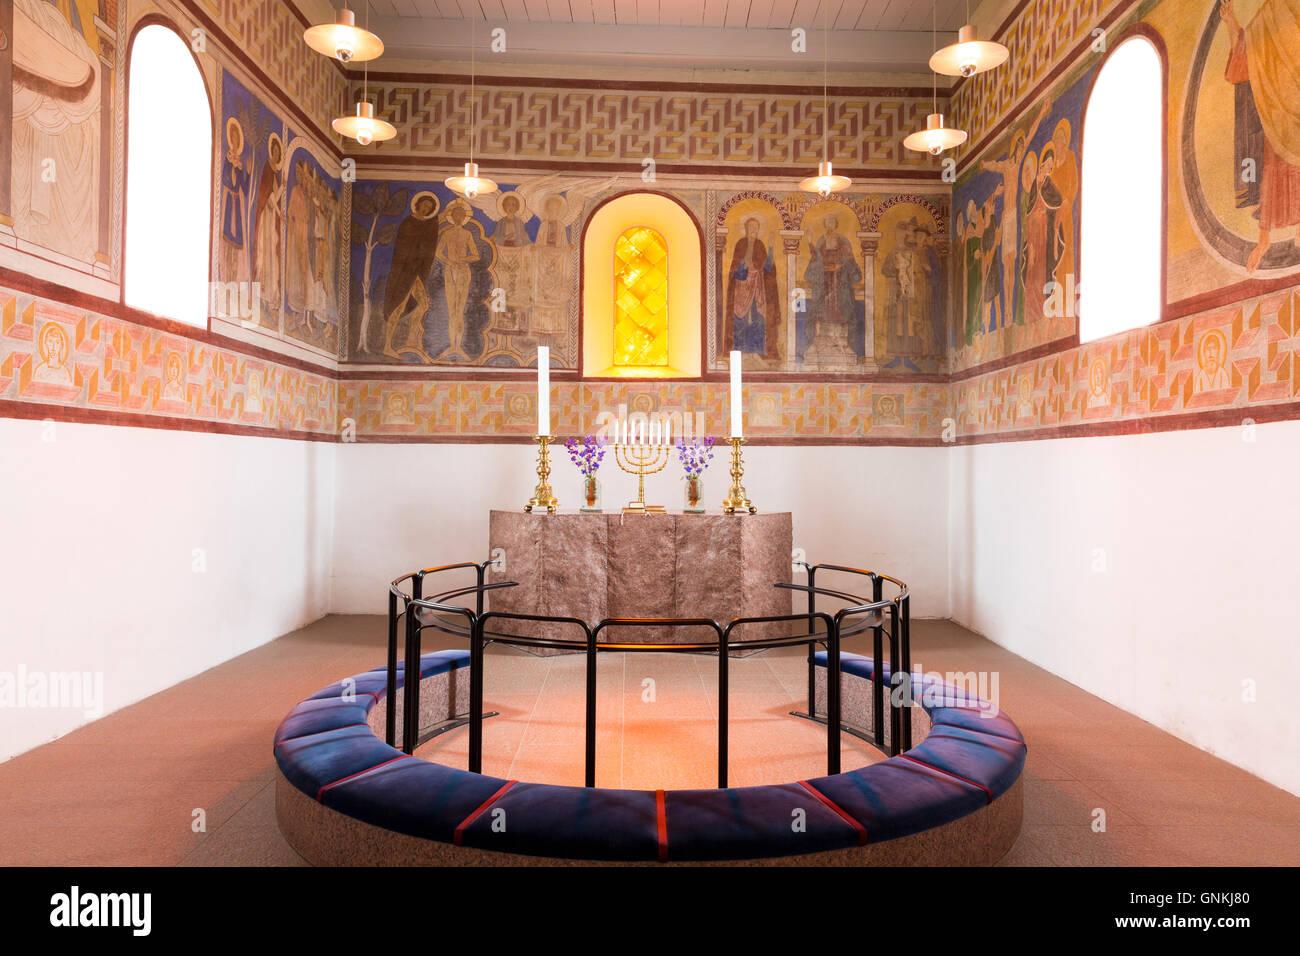 Altar at Jelling Kirke (Gudstjeneste) famous modern architecture church birthplace of Christianity in Denmark - Stock Image